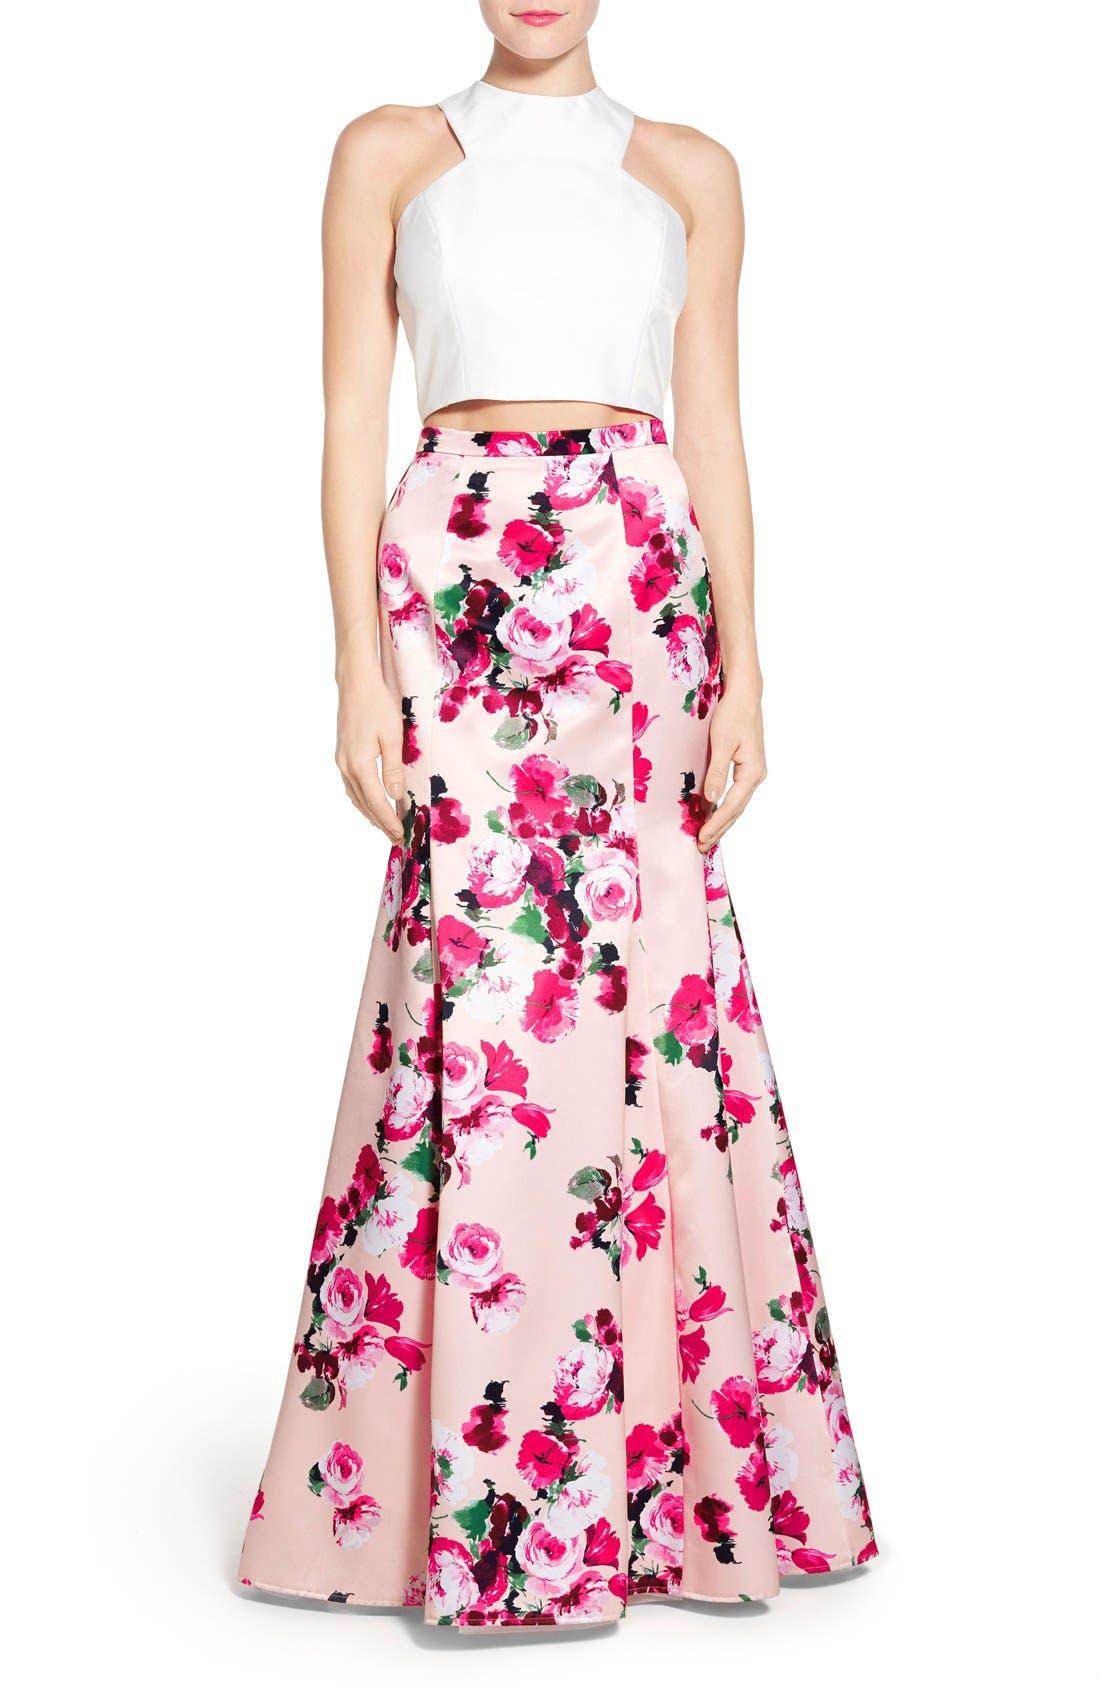 Main Image - Xscape Floral Satin Two-Piece Ballgown